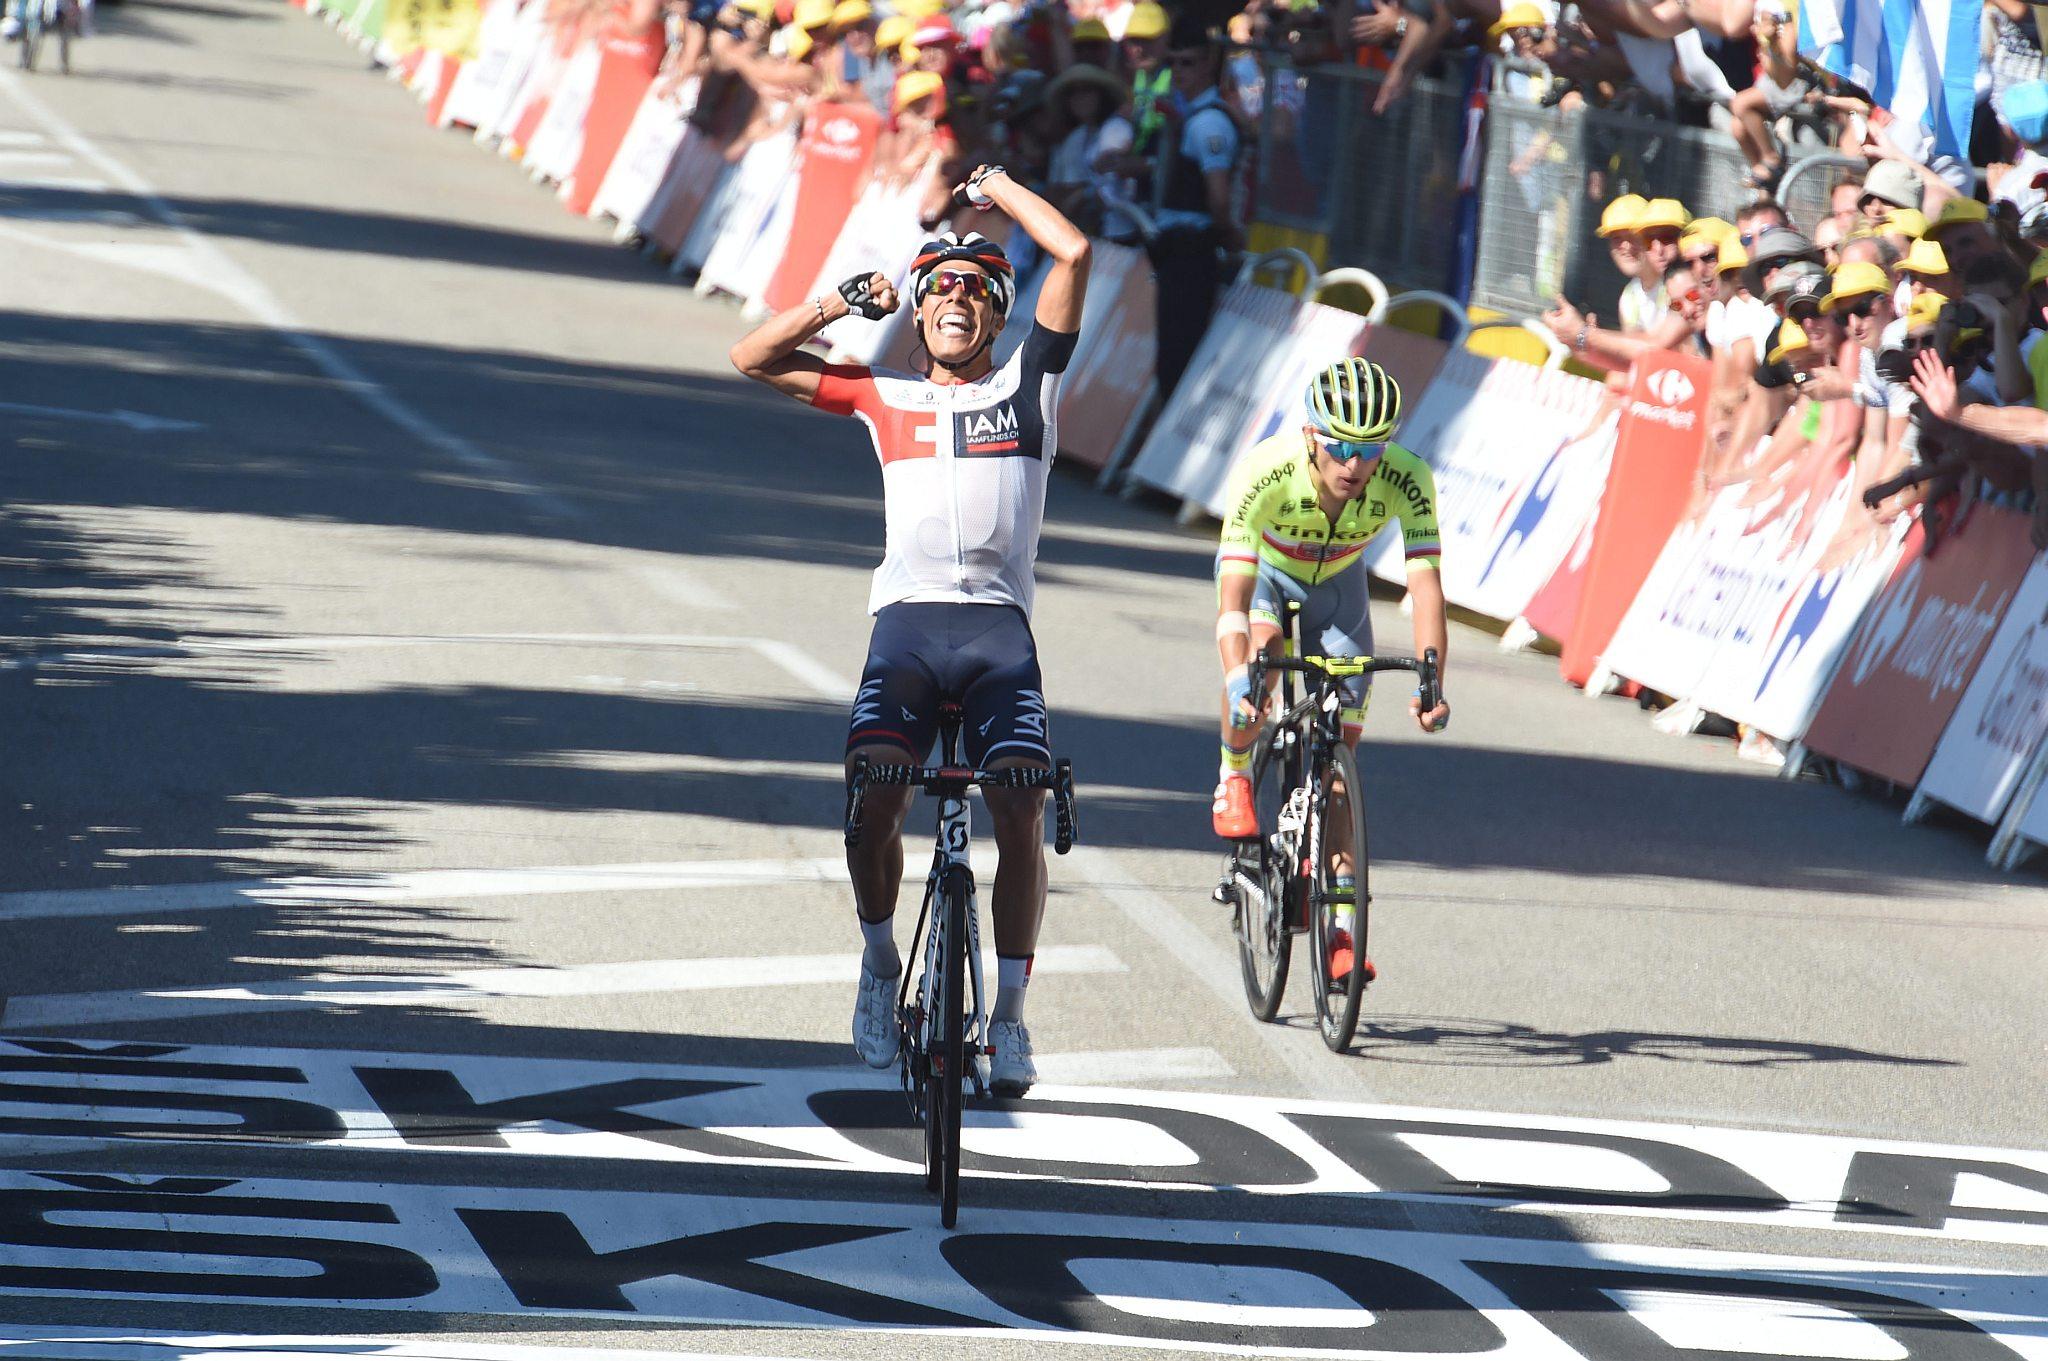 17-07-2016 Tour De France; Tappa 15 Bourg En Bresse - Culoz; 2016, Iam Cycling; 2016, Tinkoff; Pantano Gomez, Jarlinson; Majka, Rafal; Culoz;